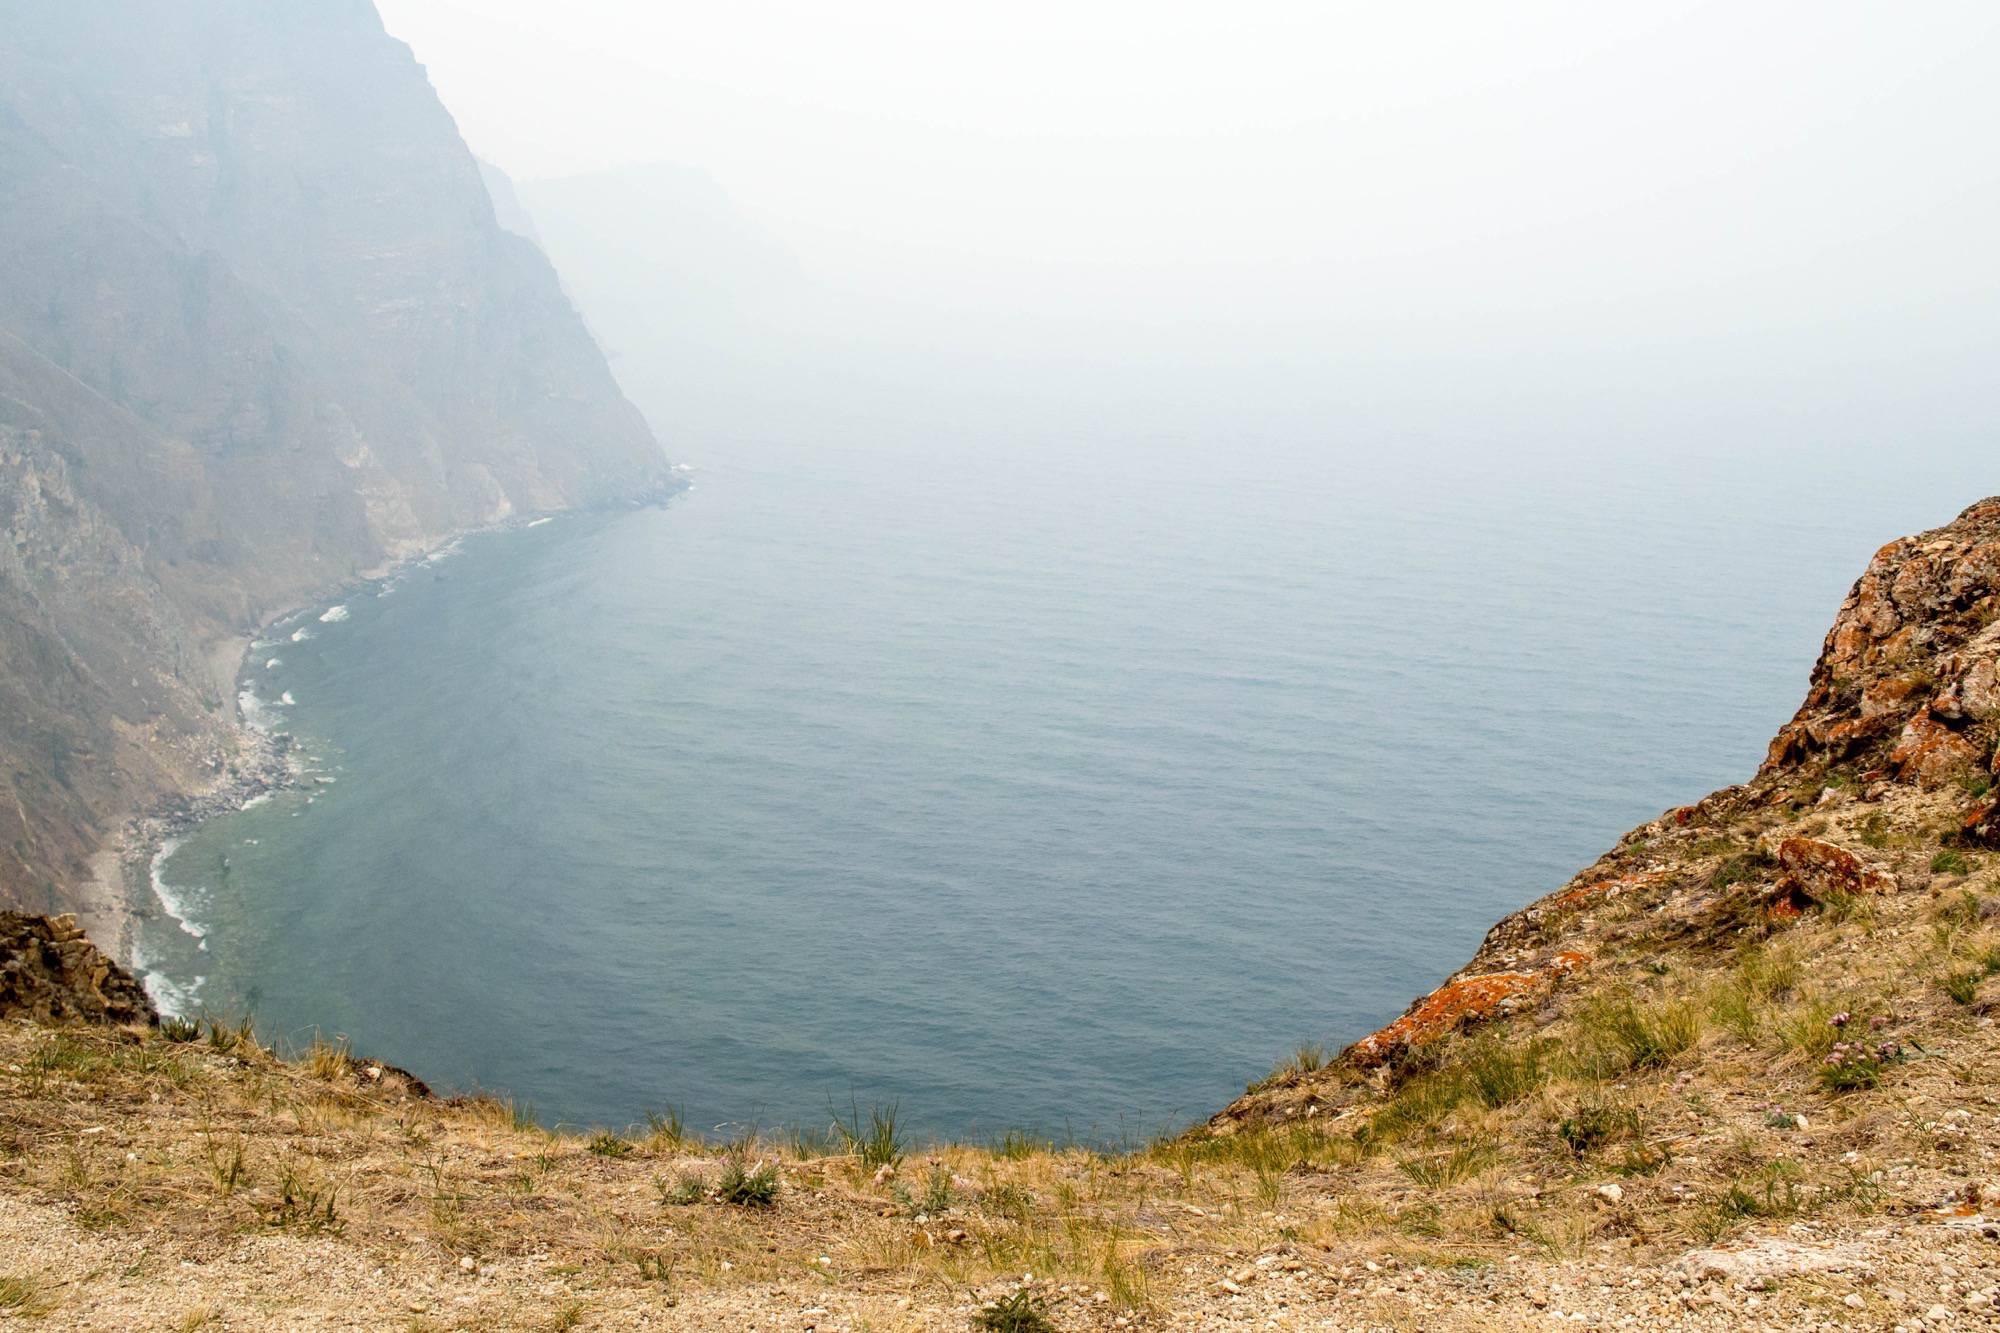 Lake Baikal, Olkhon Island